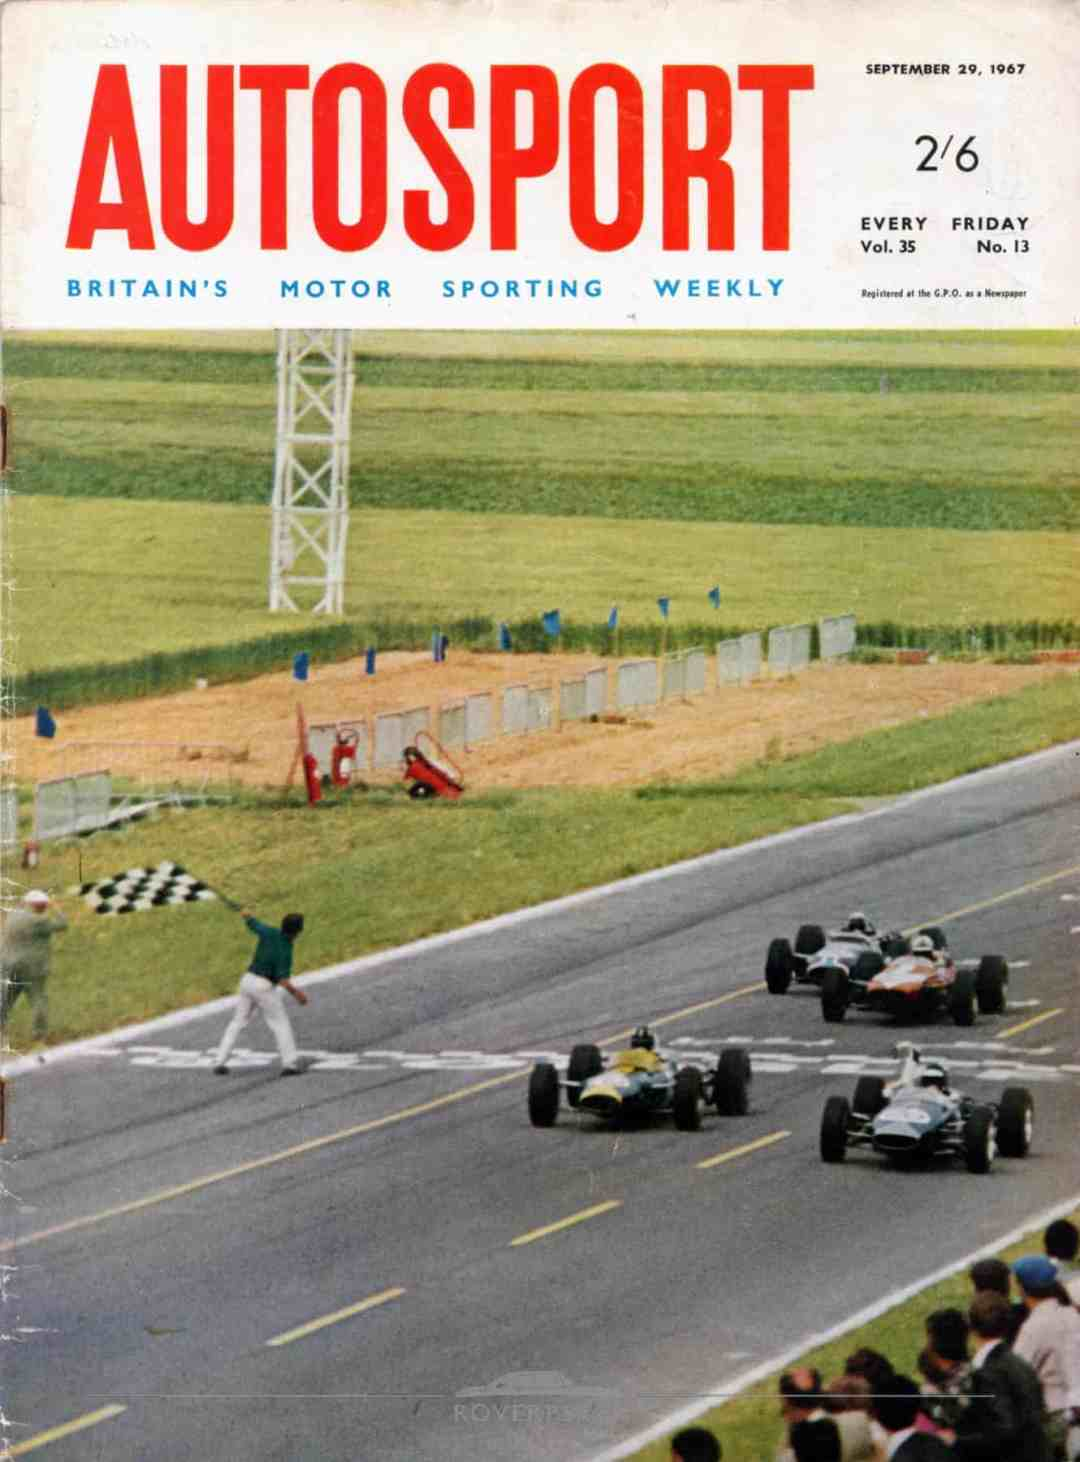 Magazine - 19670929 - Autosport - Front Cover